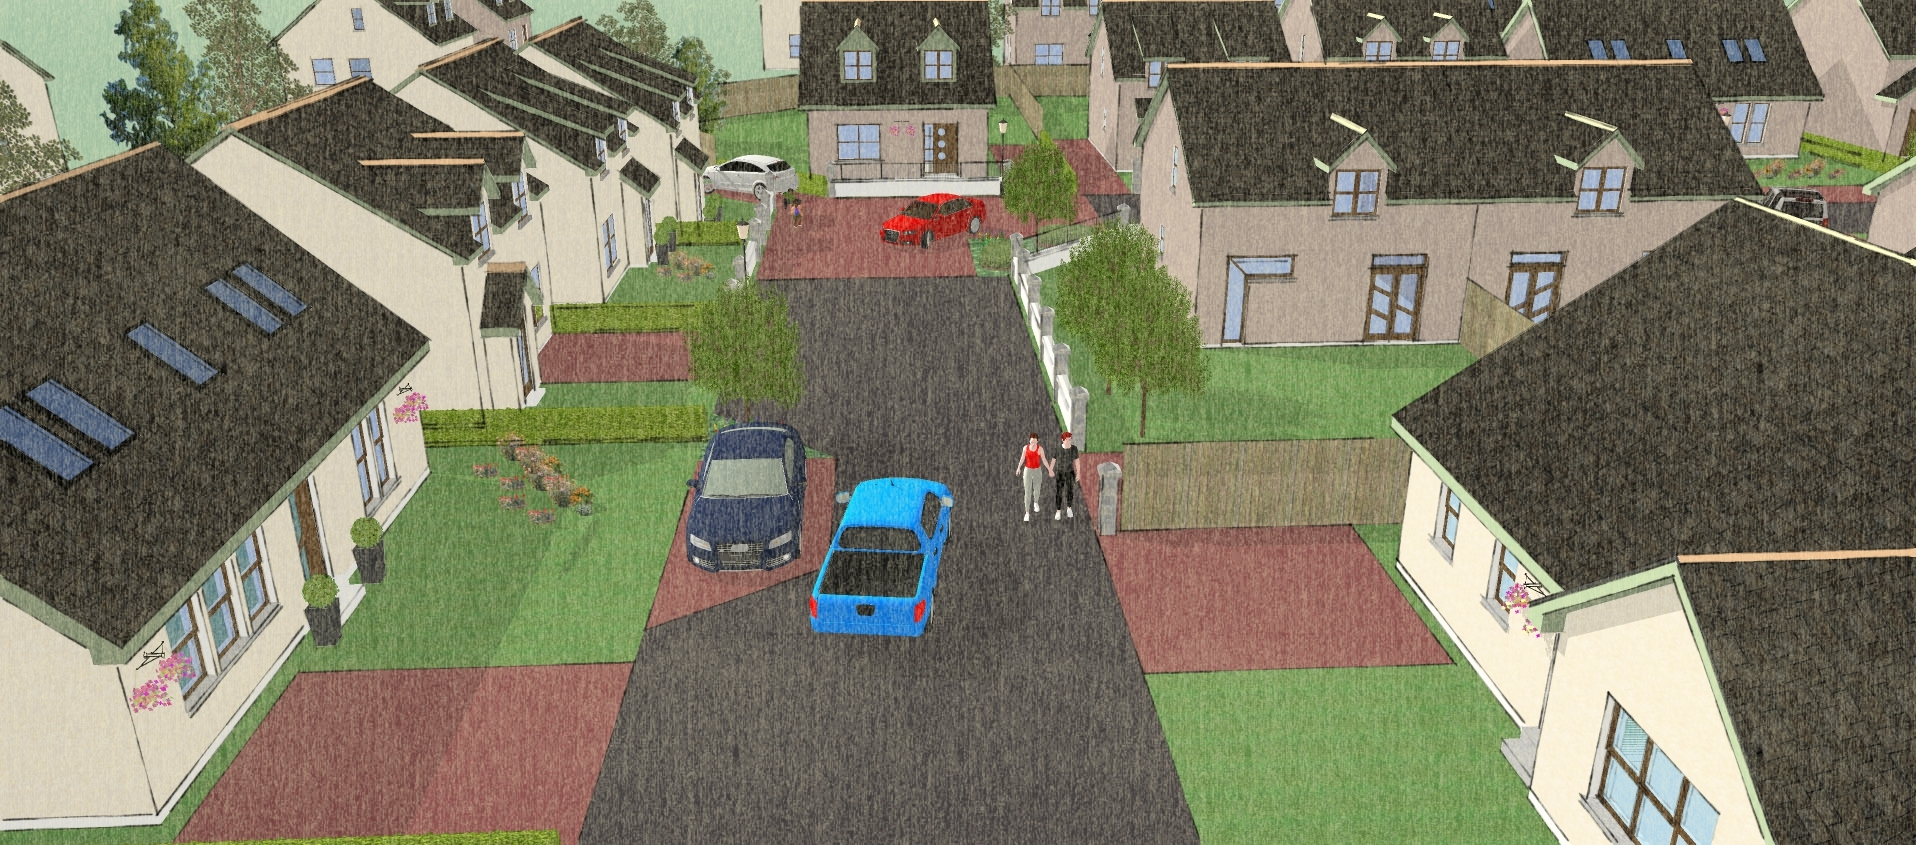 The new Kirkton development